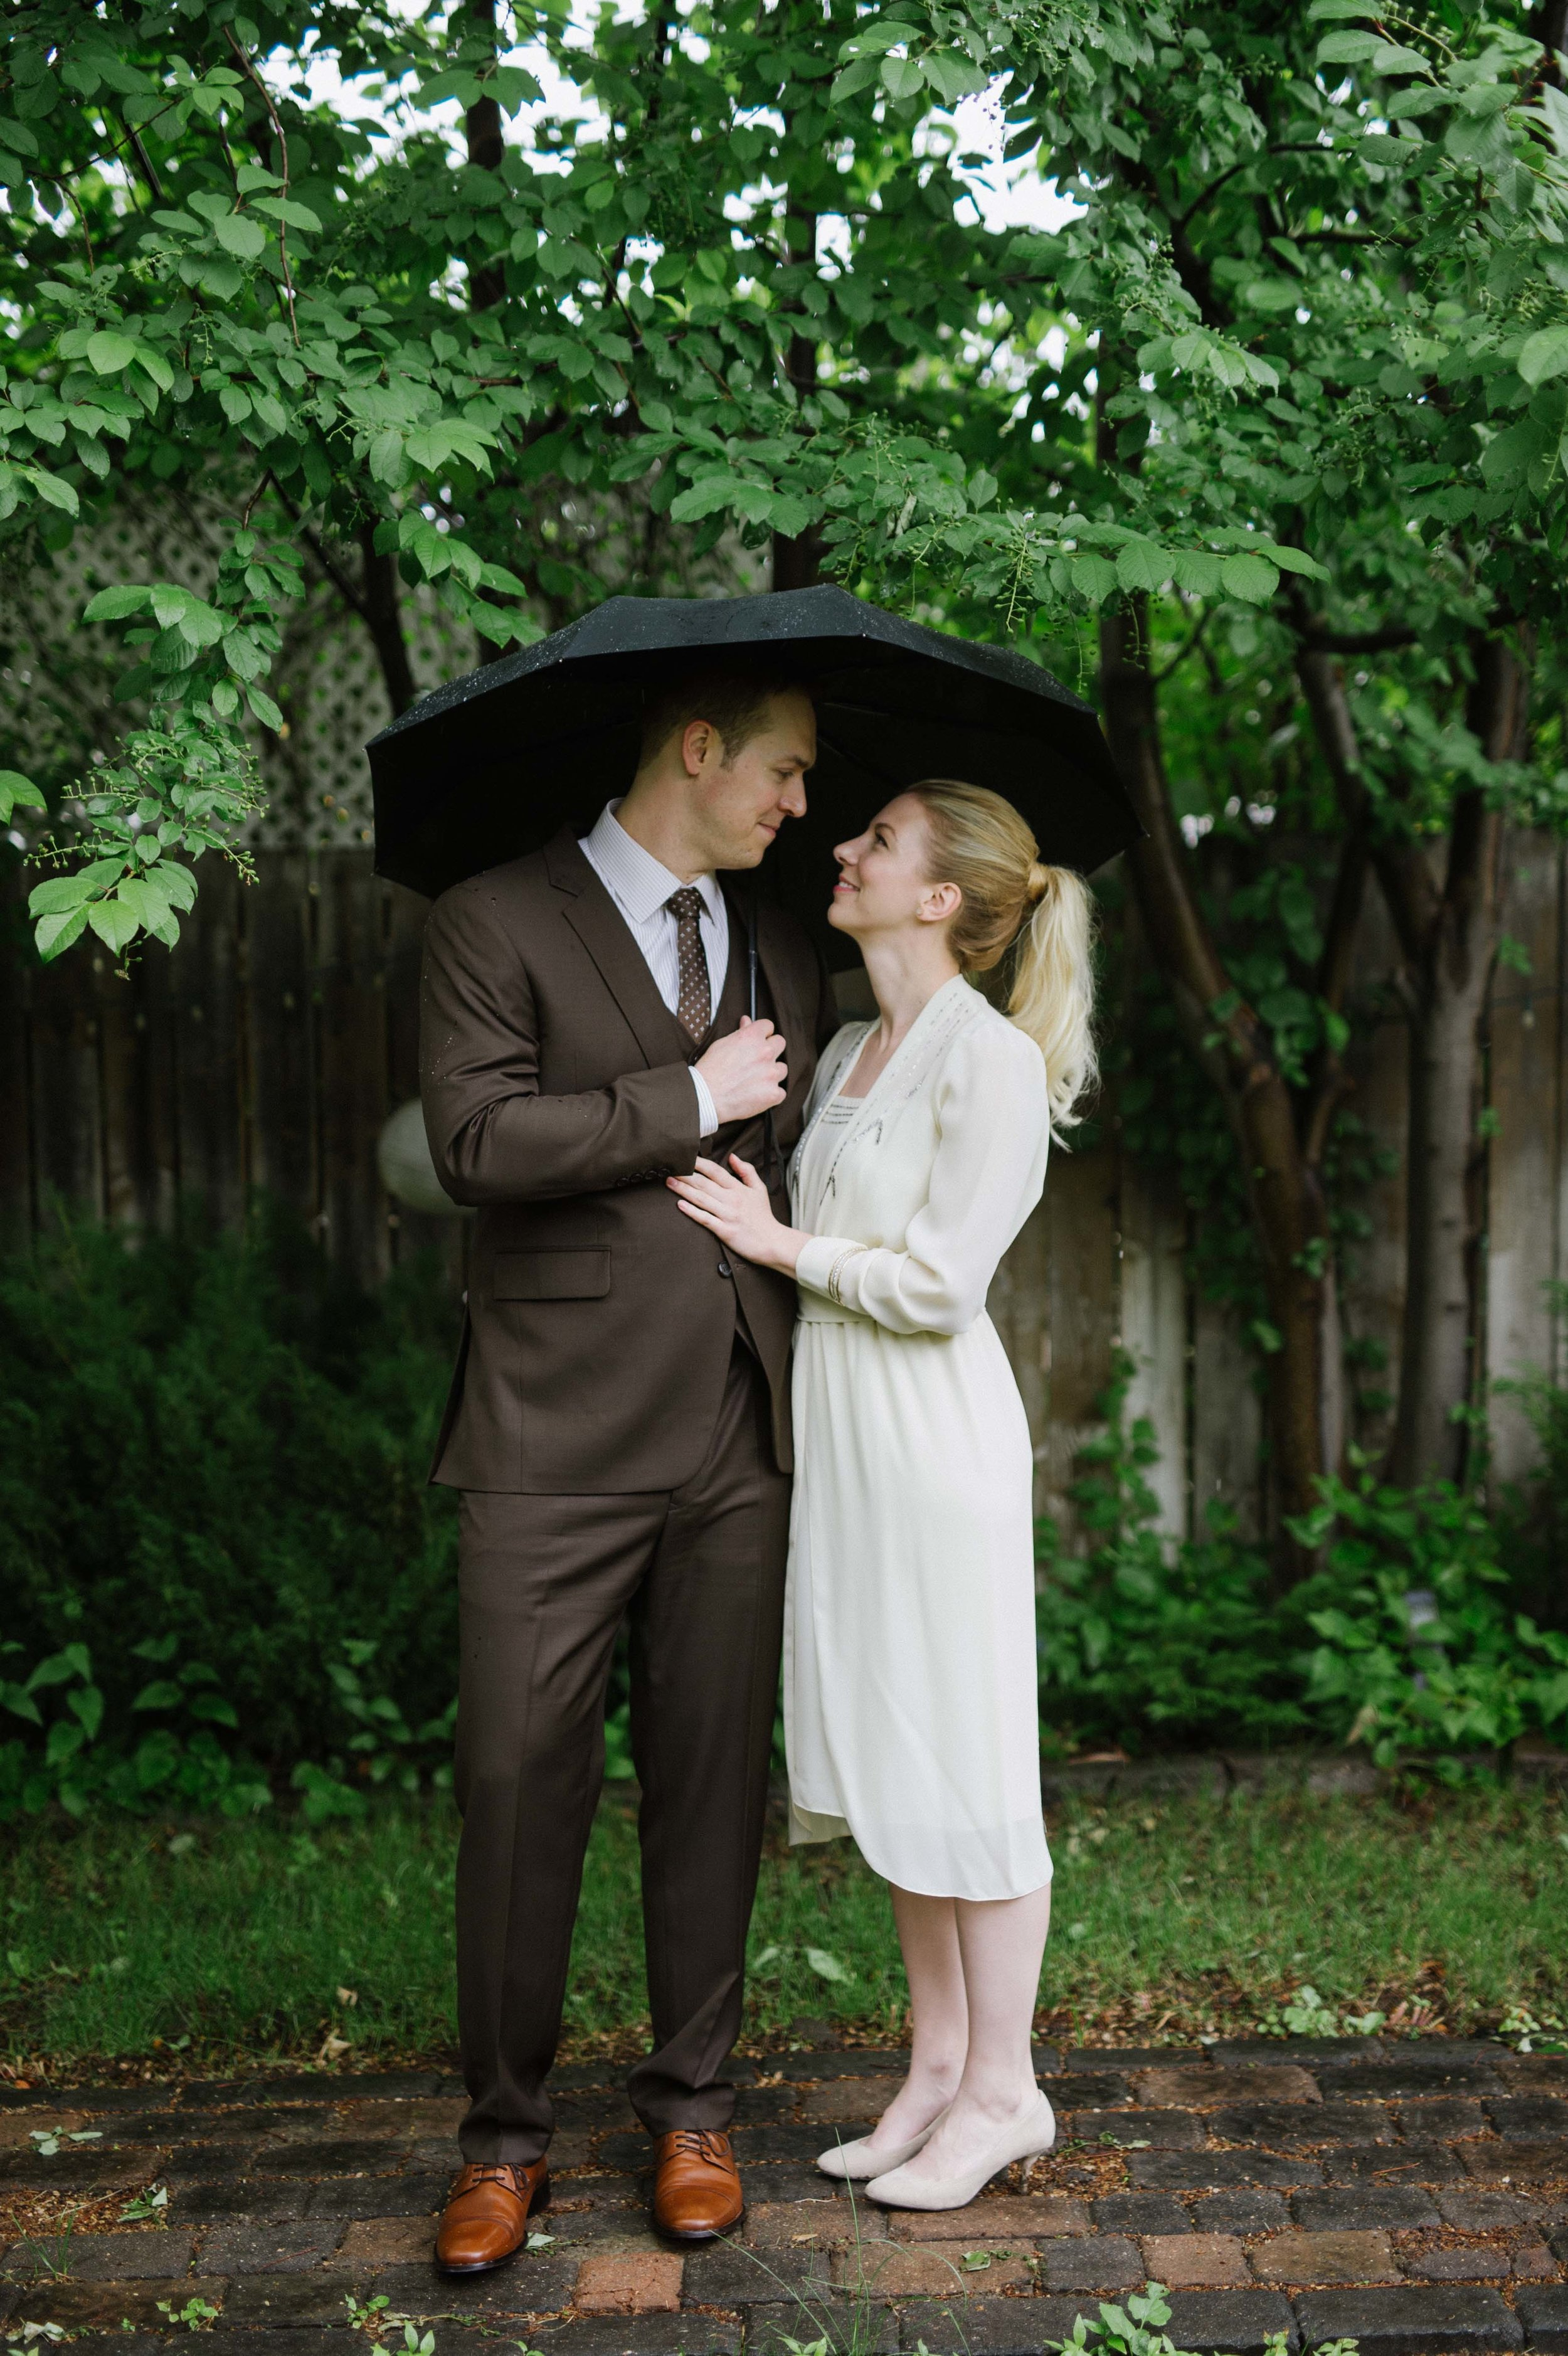 Christy-D-Swanberg-Photography-Calgary-wedding-elopement-31.jpg